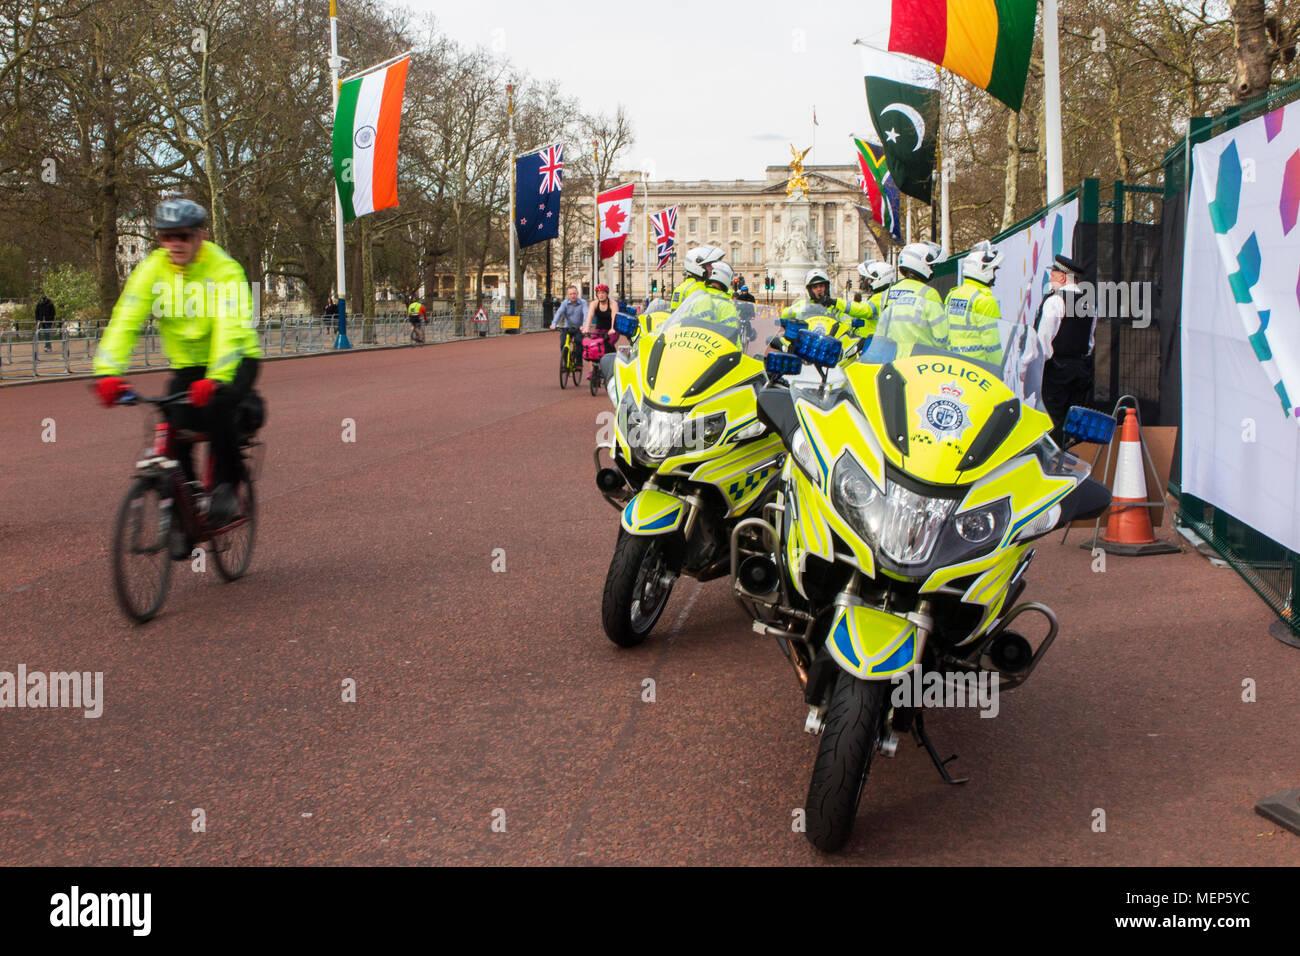 Police Pedal Bike Bicycle Stock Photos & Police Pedal Bike